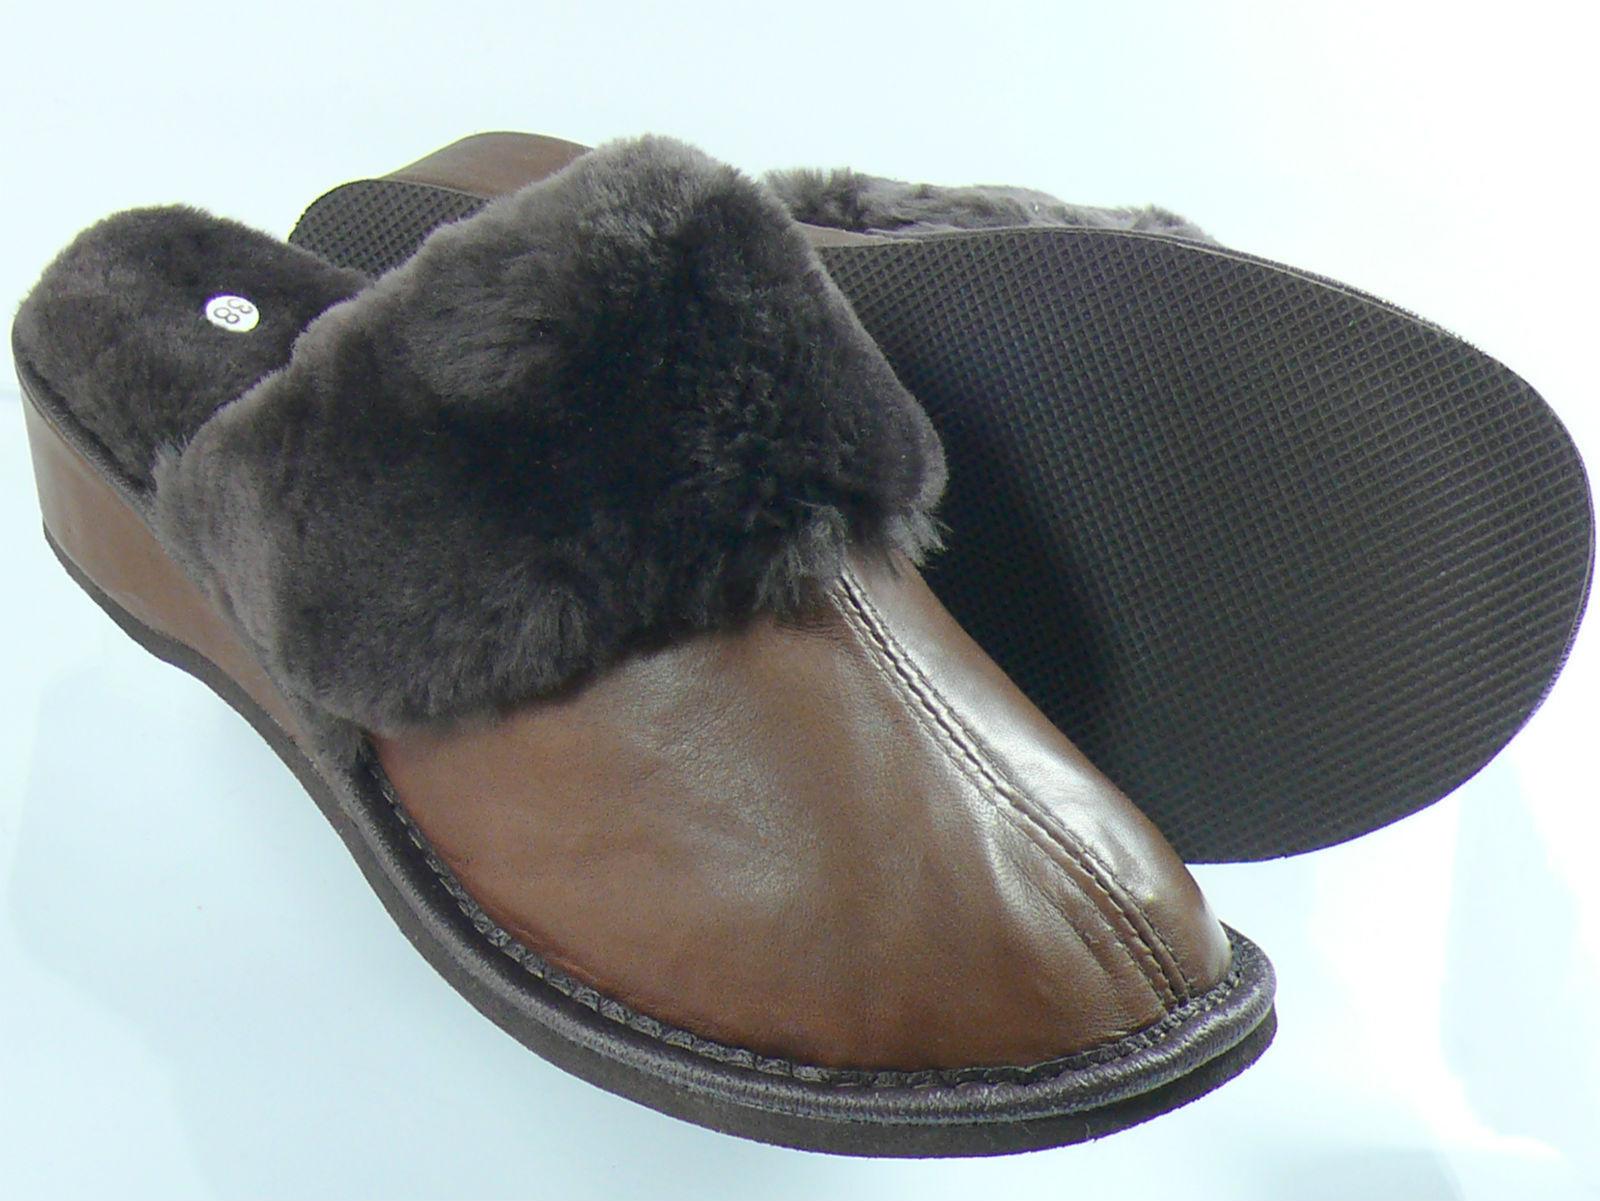 SHEEPSKIN SLIPPERS LADIES MULE STYLE 100%  GENUINE LEATHER UPPER AND INNER